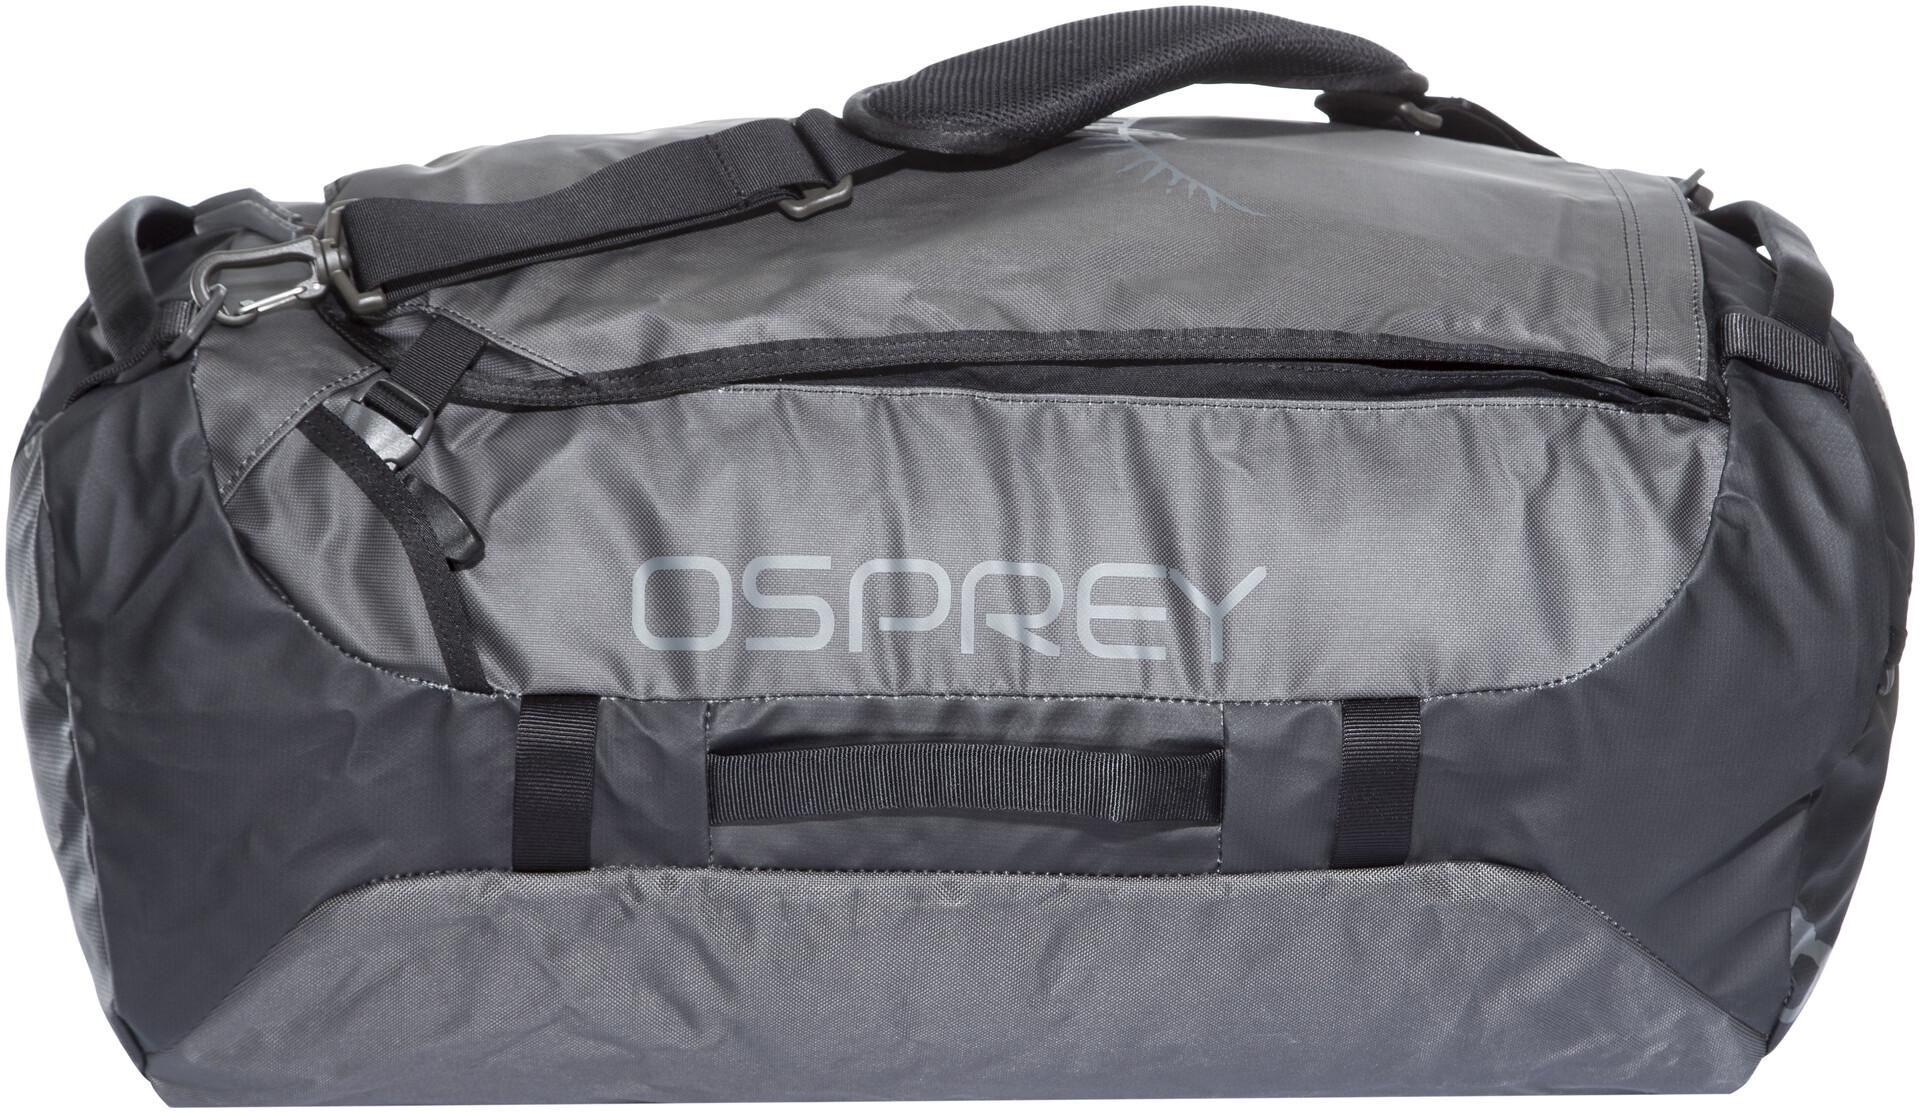 Osprey Transporter 65 Duffel Bag, black